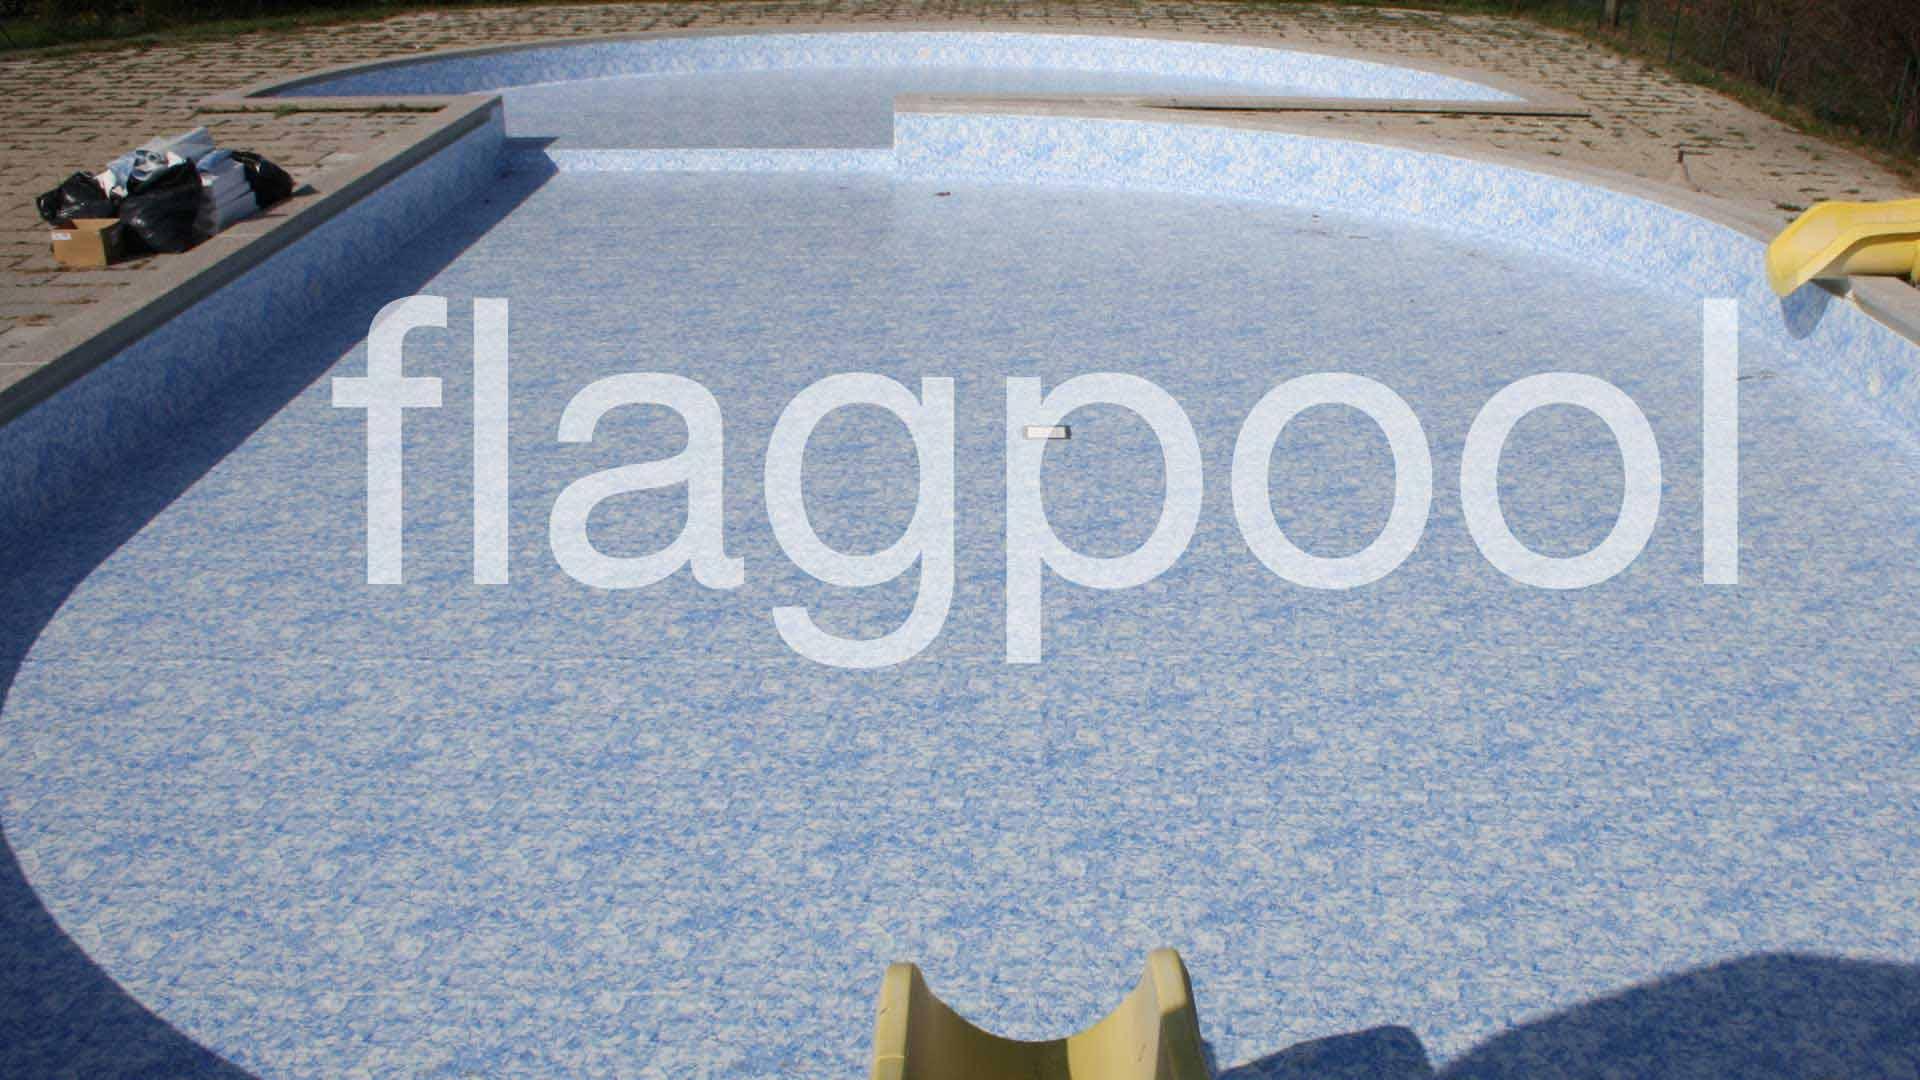 Water Treatment Manual | Flagpool tout Chloramine Piscine